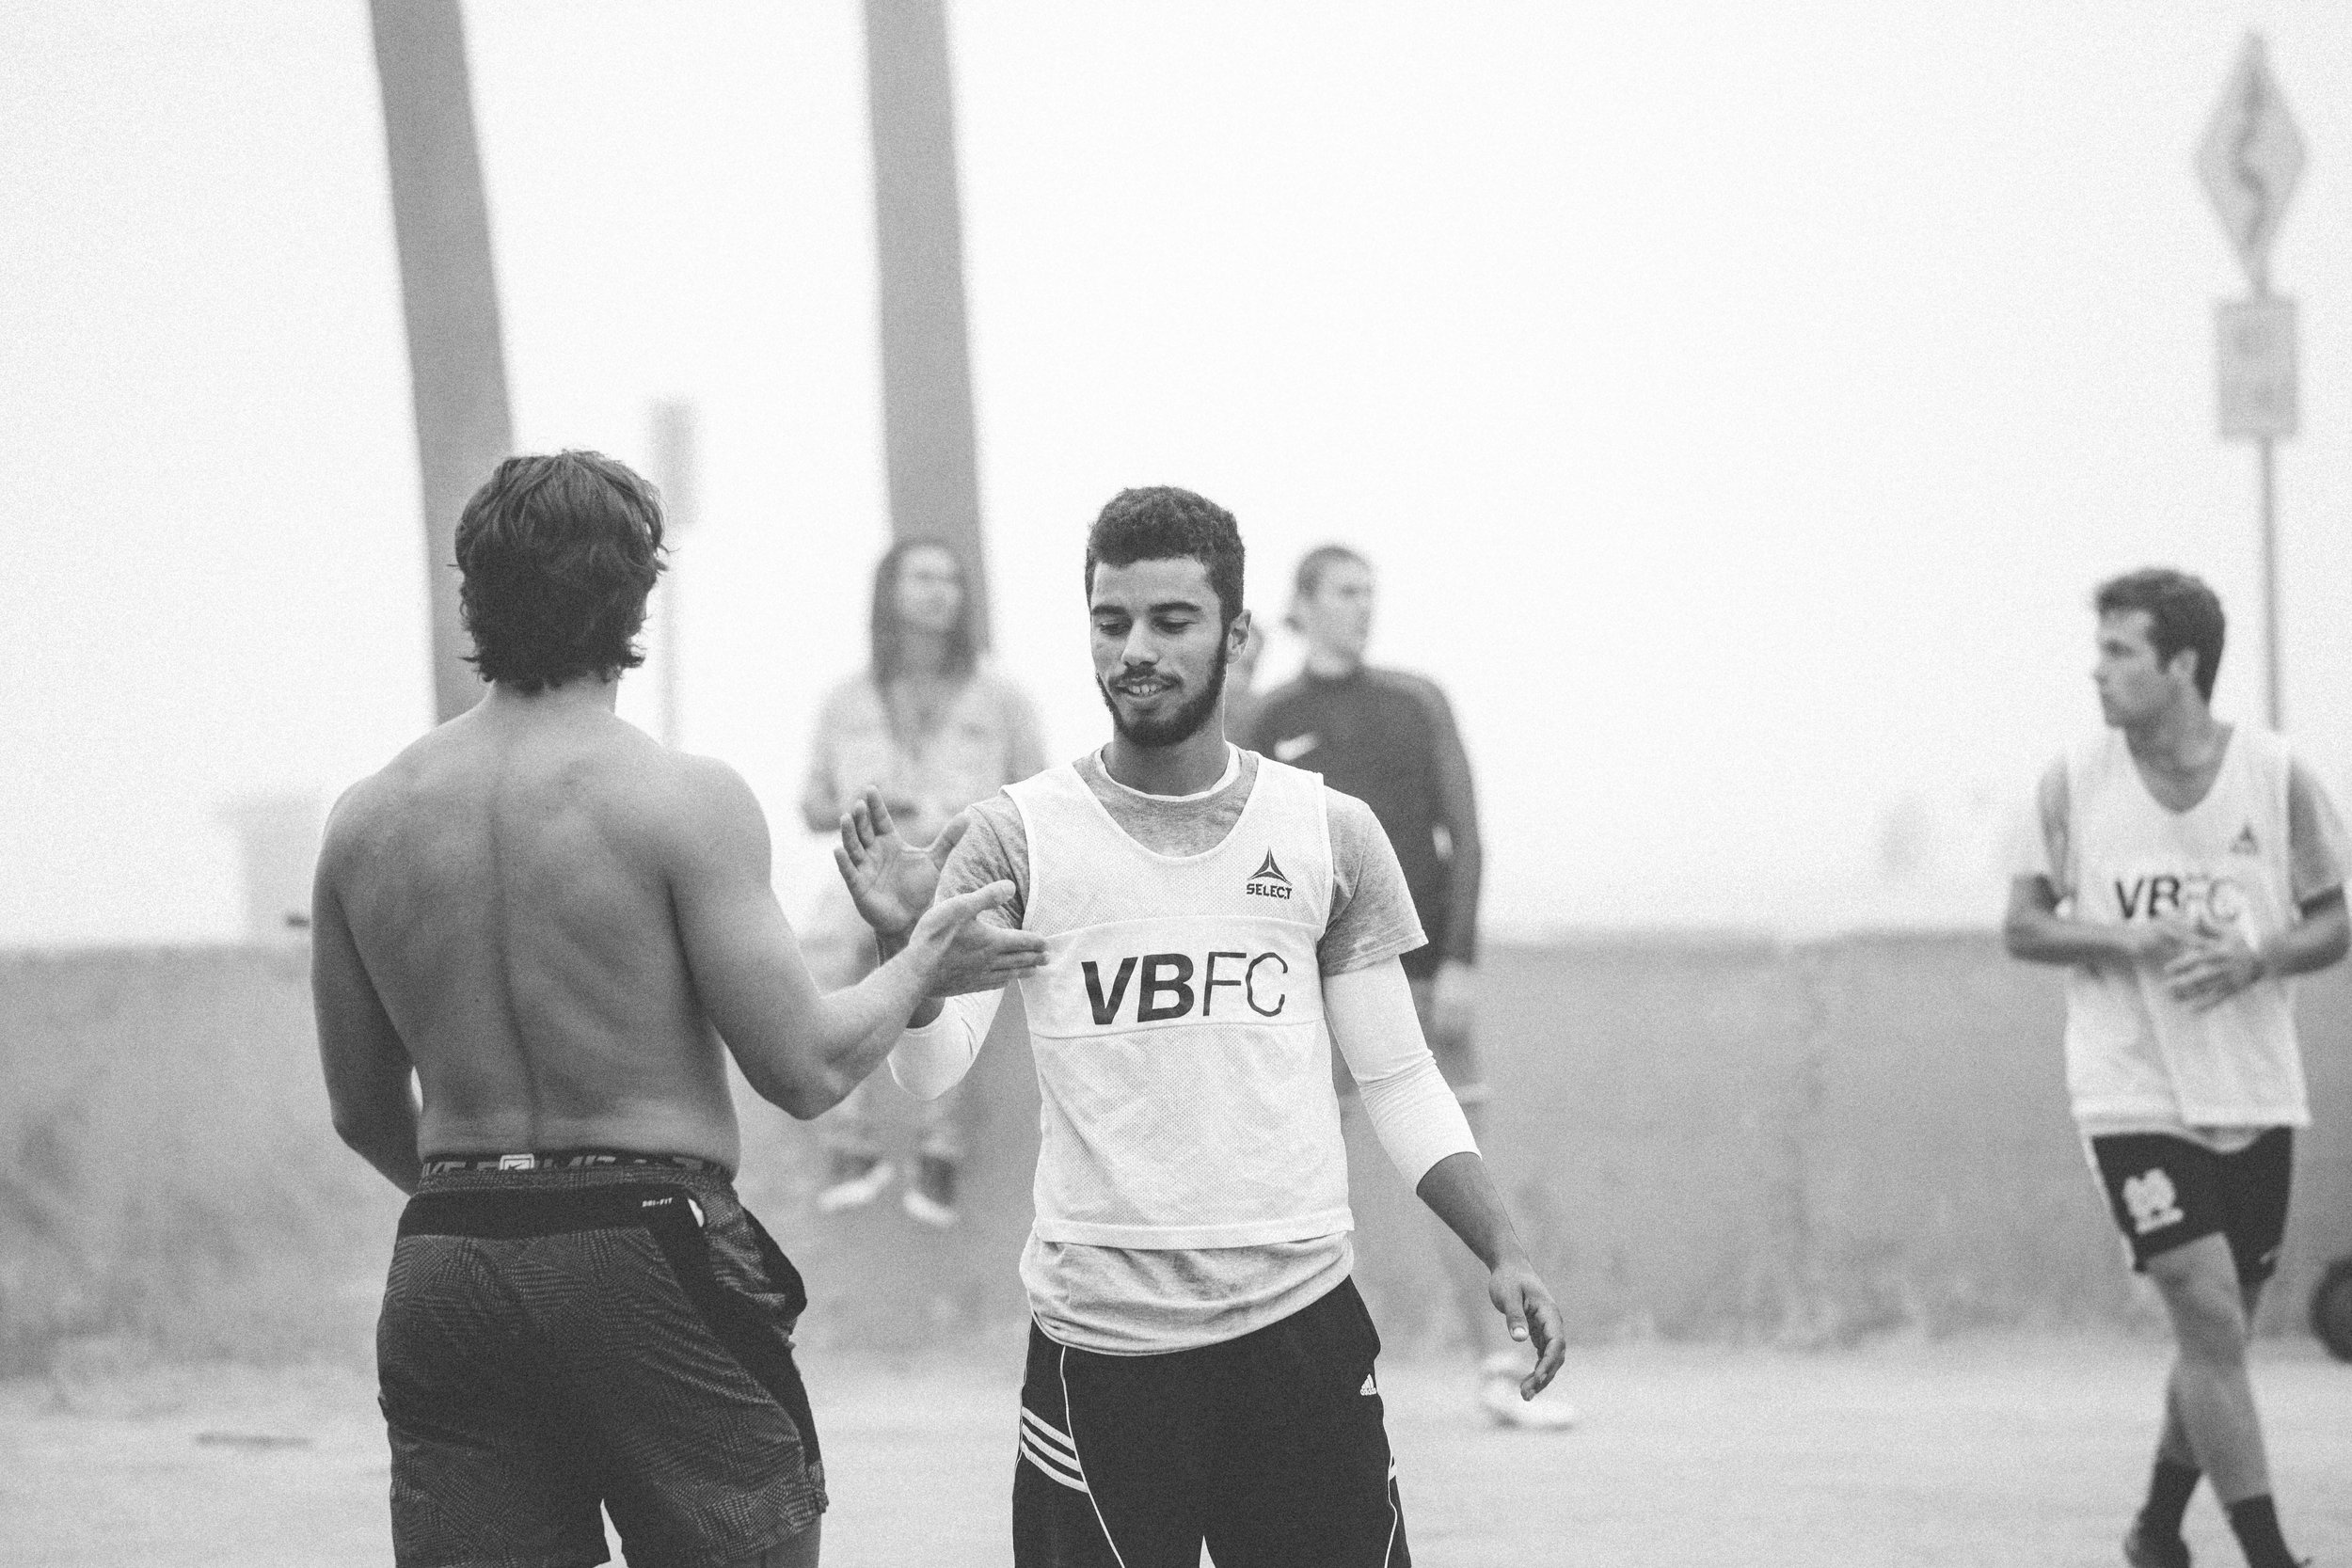 11-04-18-Venice Beach, VBFC Black and White-2415.jpg